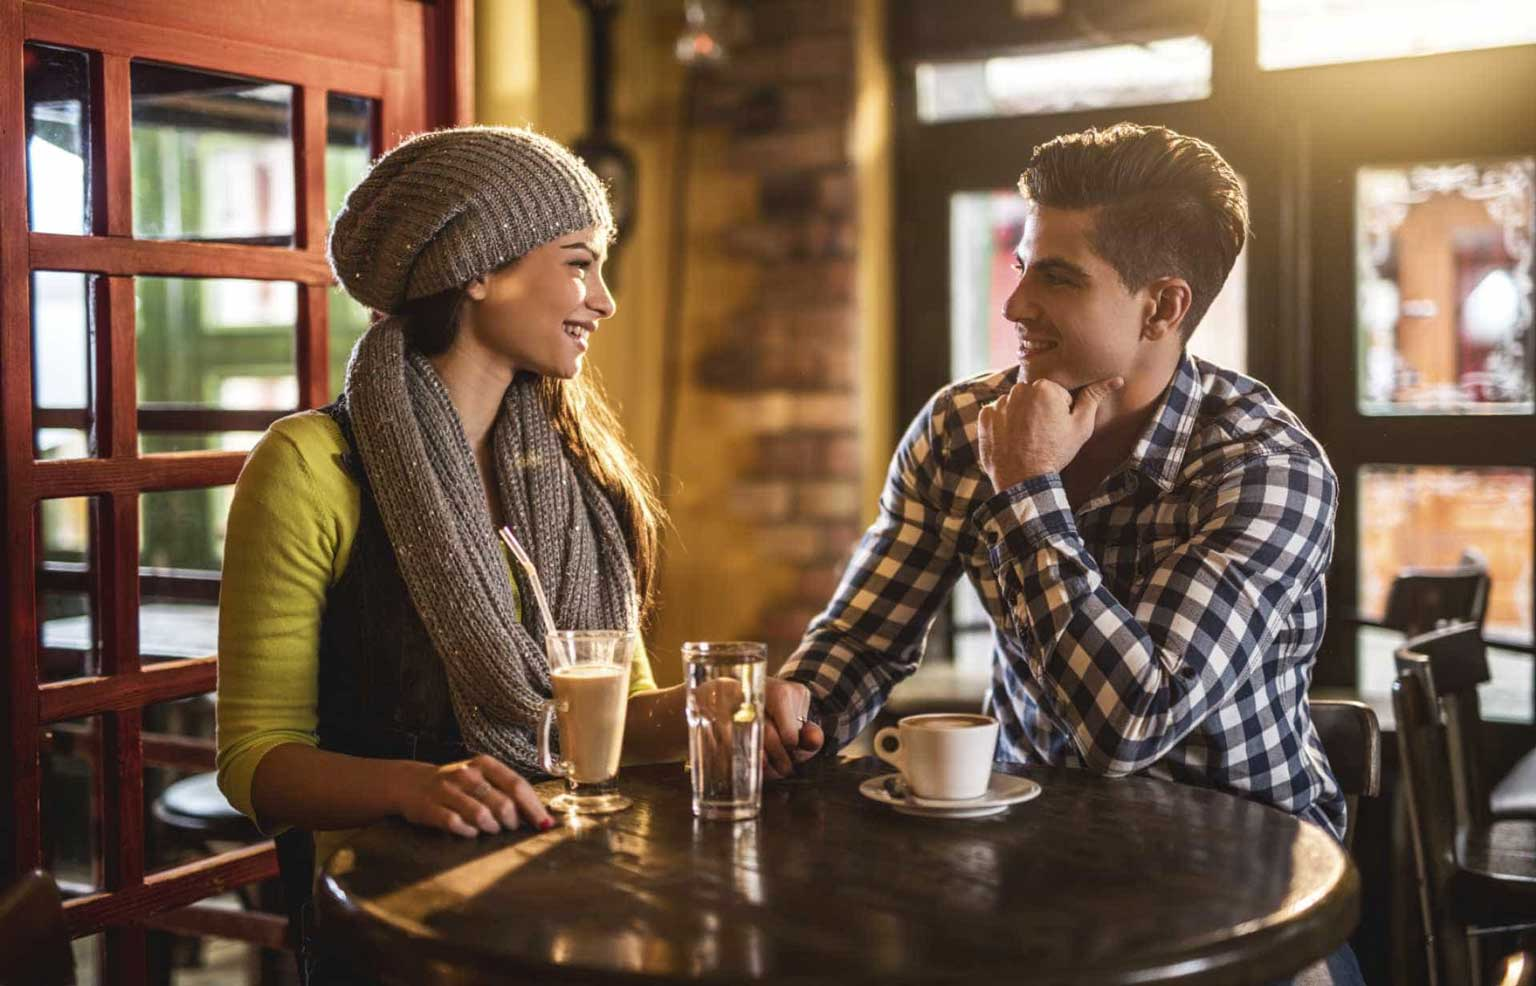 differenza tra incontri di conversazione e relazione PUA online consigli di dating